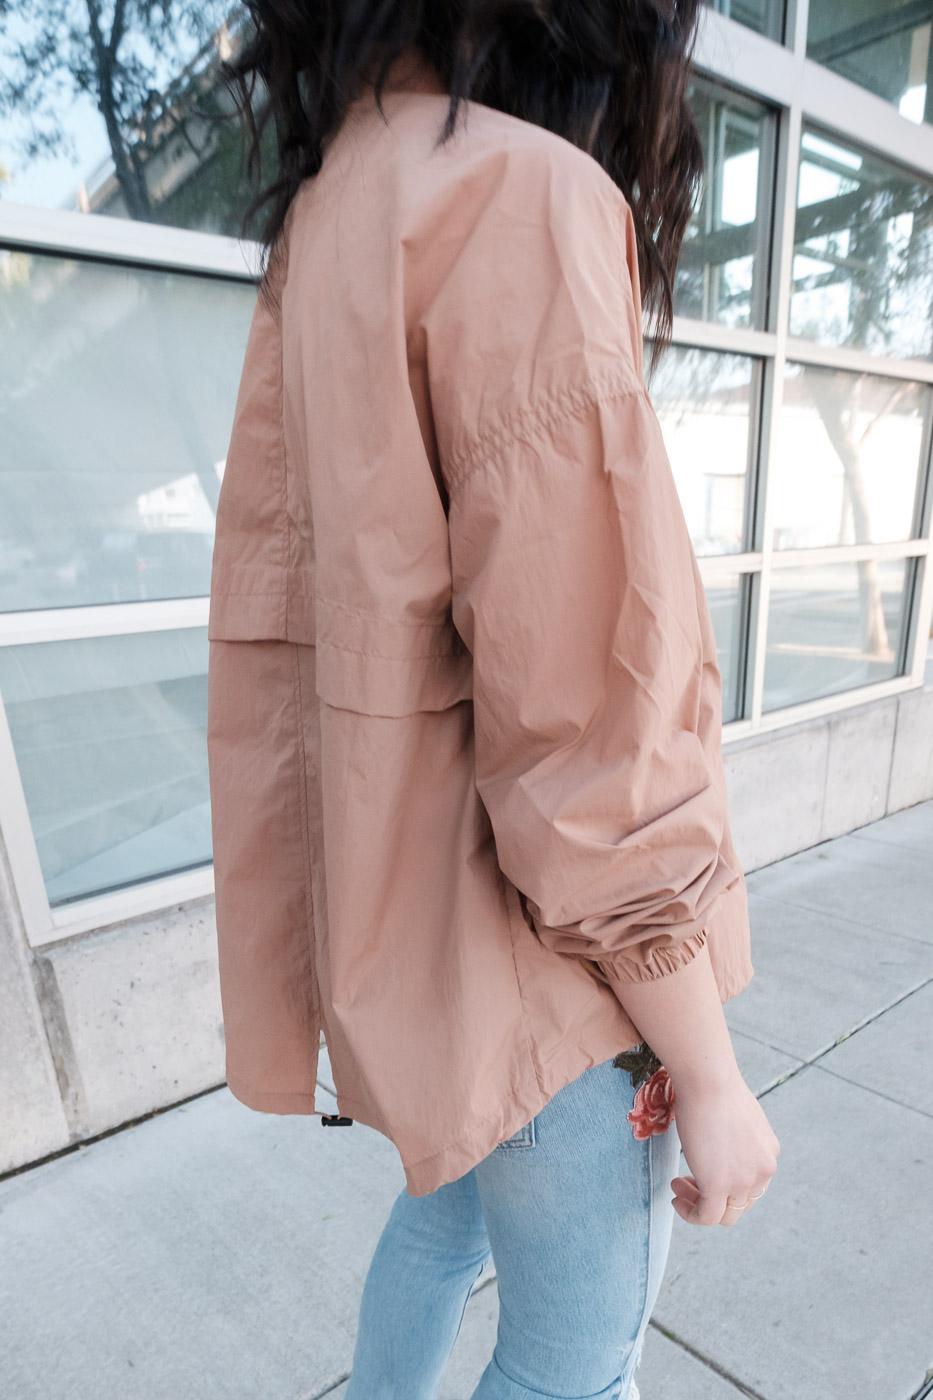 vero-moda-lightweight-jacket-spring-outfit-idea-7